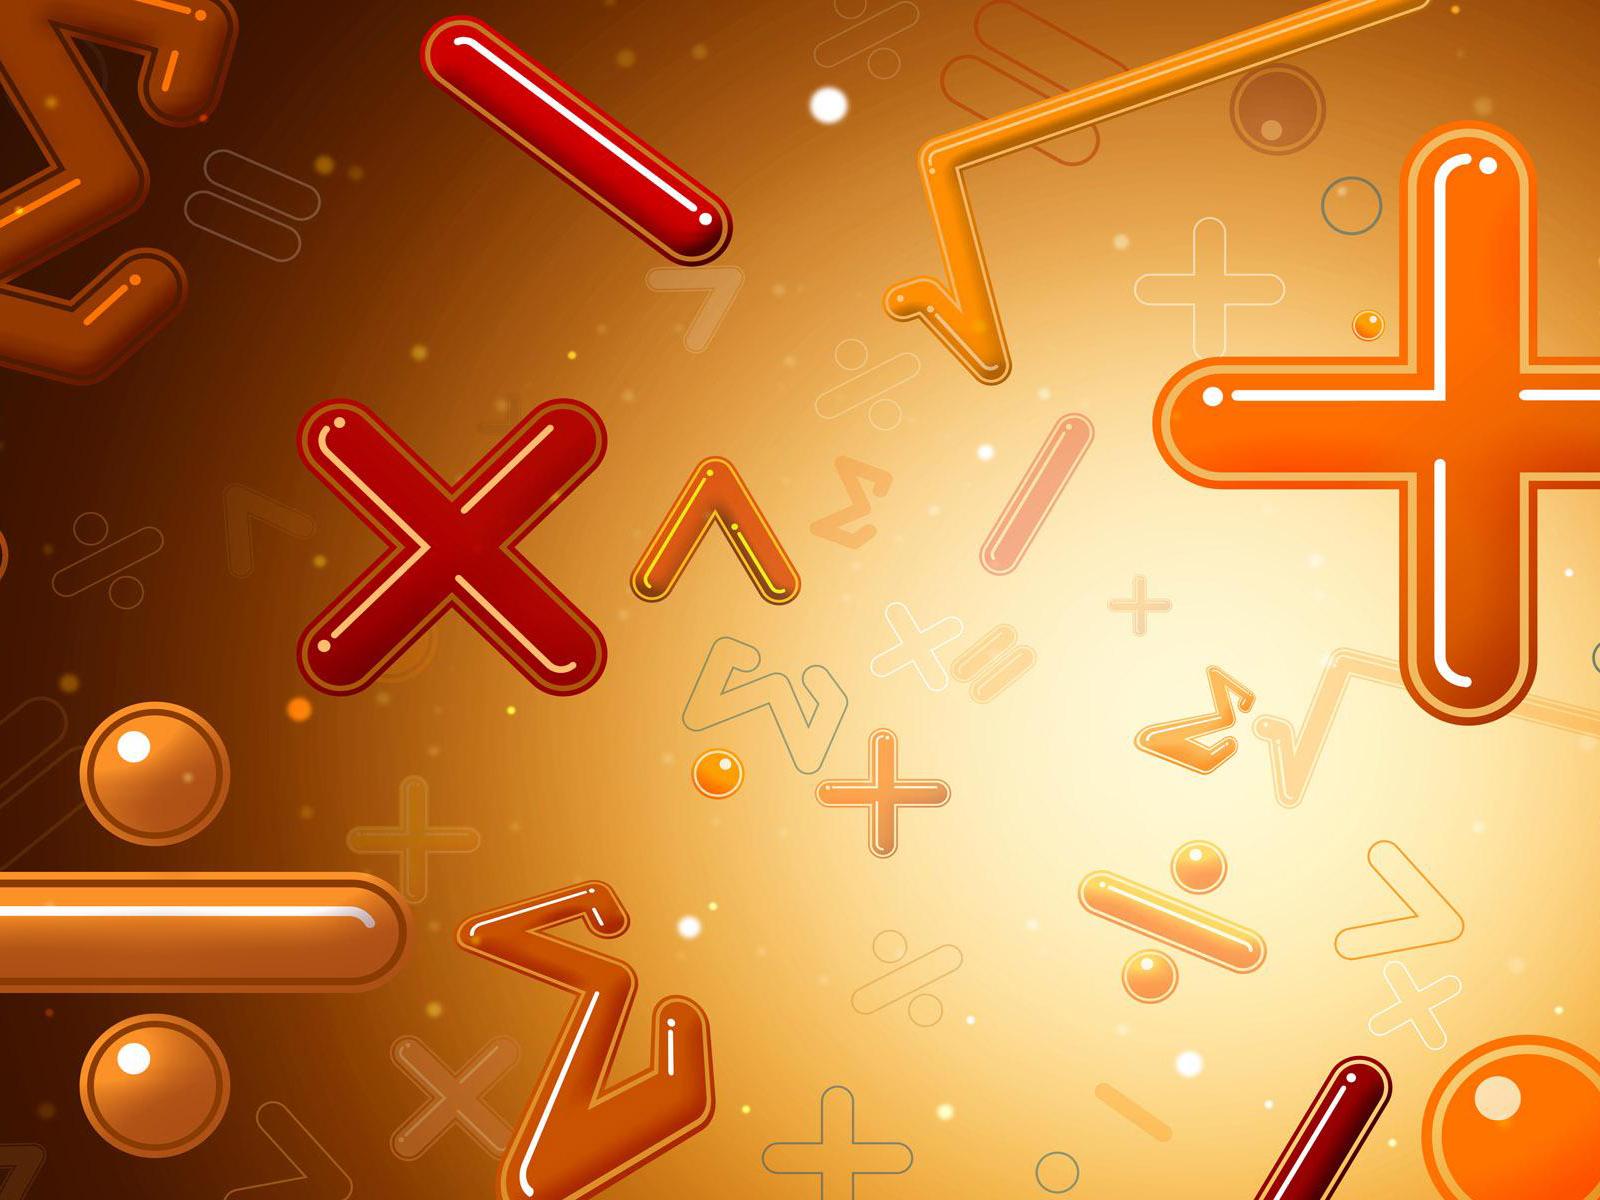 Math PPT Design Backgrounds - PPT Backgrounds Templates